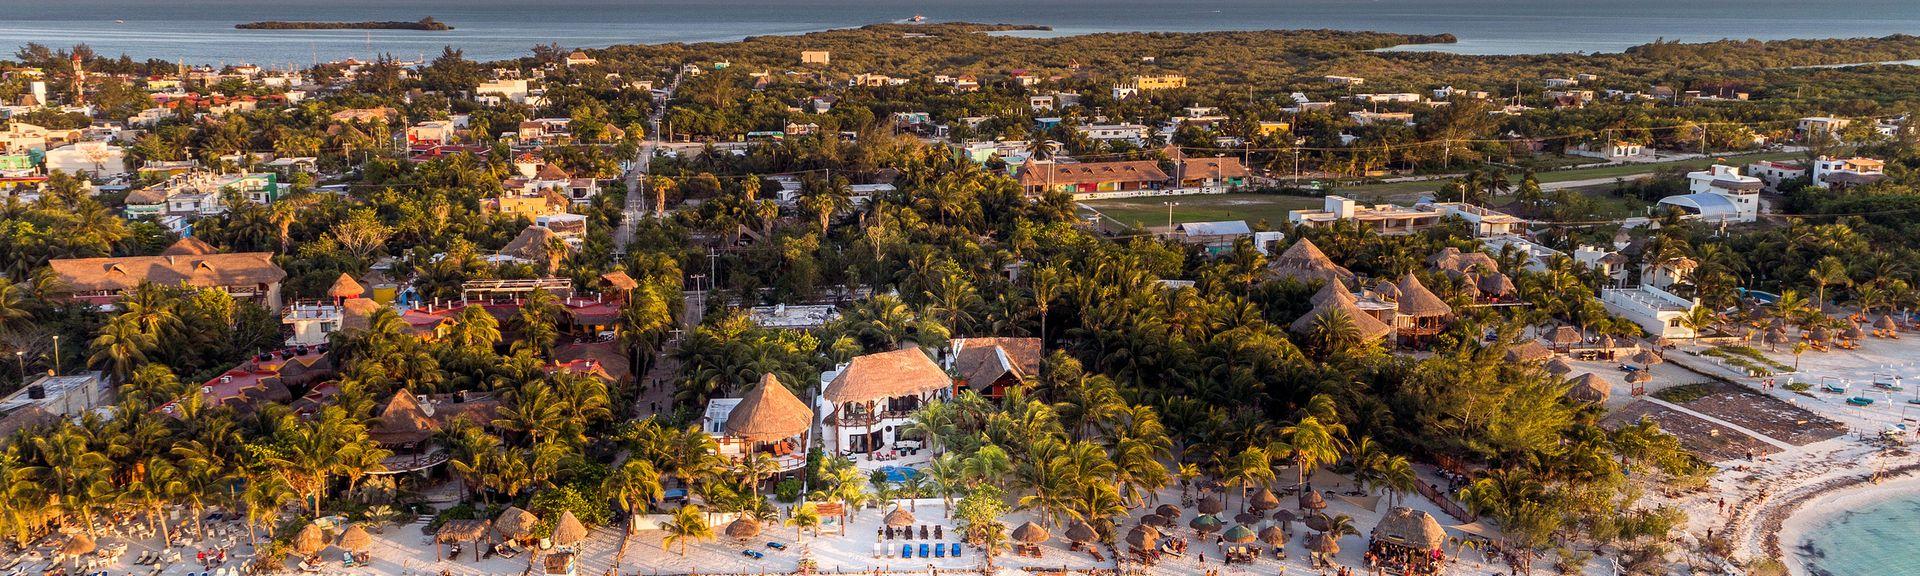 Holbox Island, Isla Holbox, Quintana Roo, México